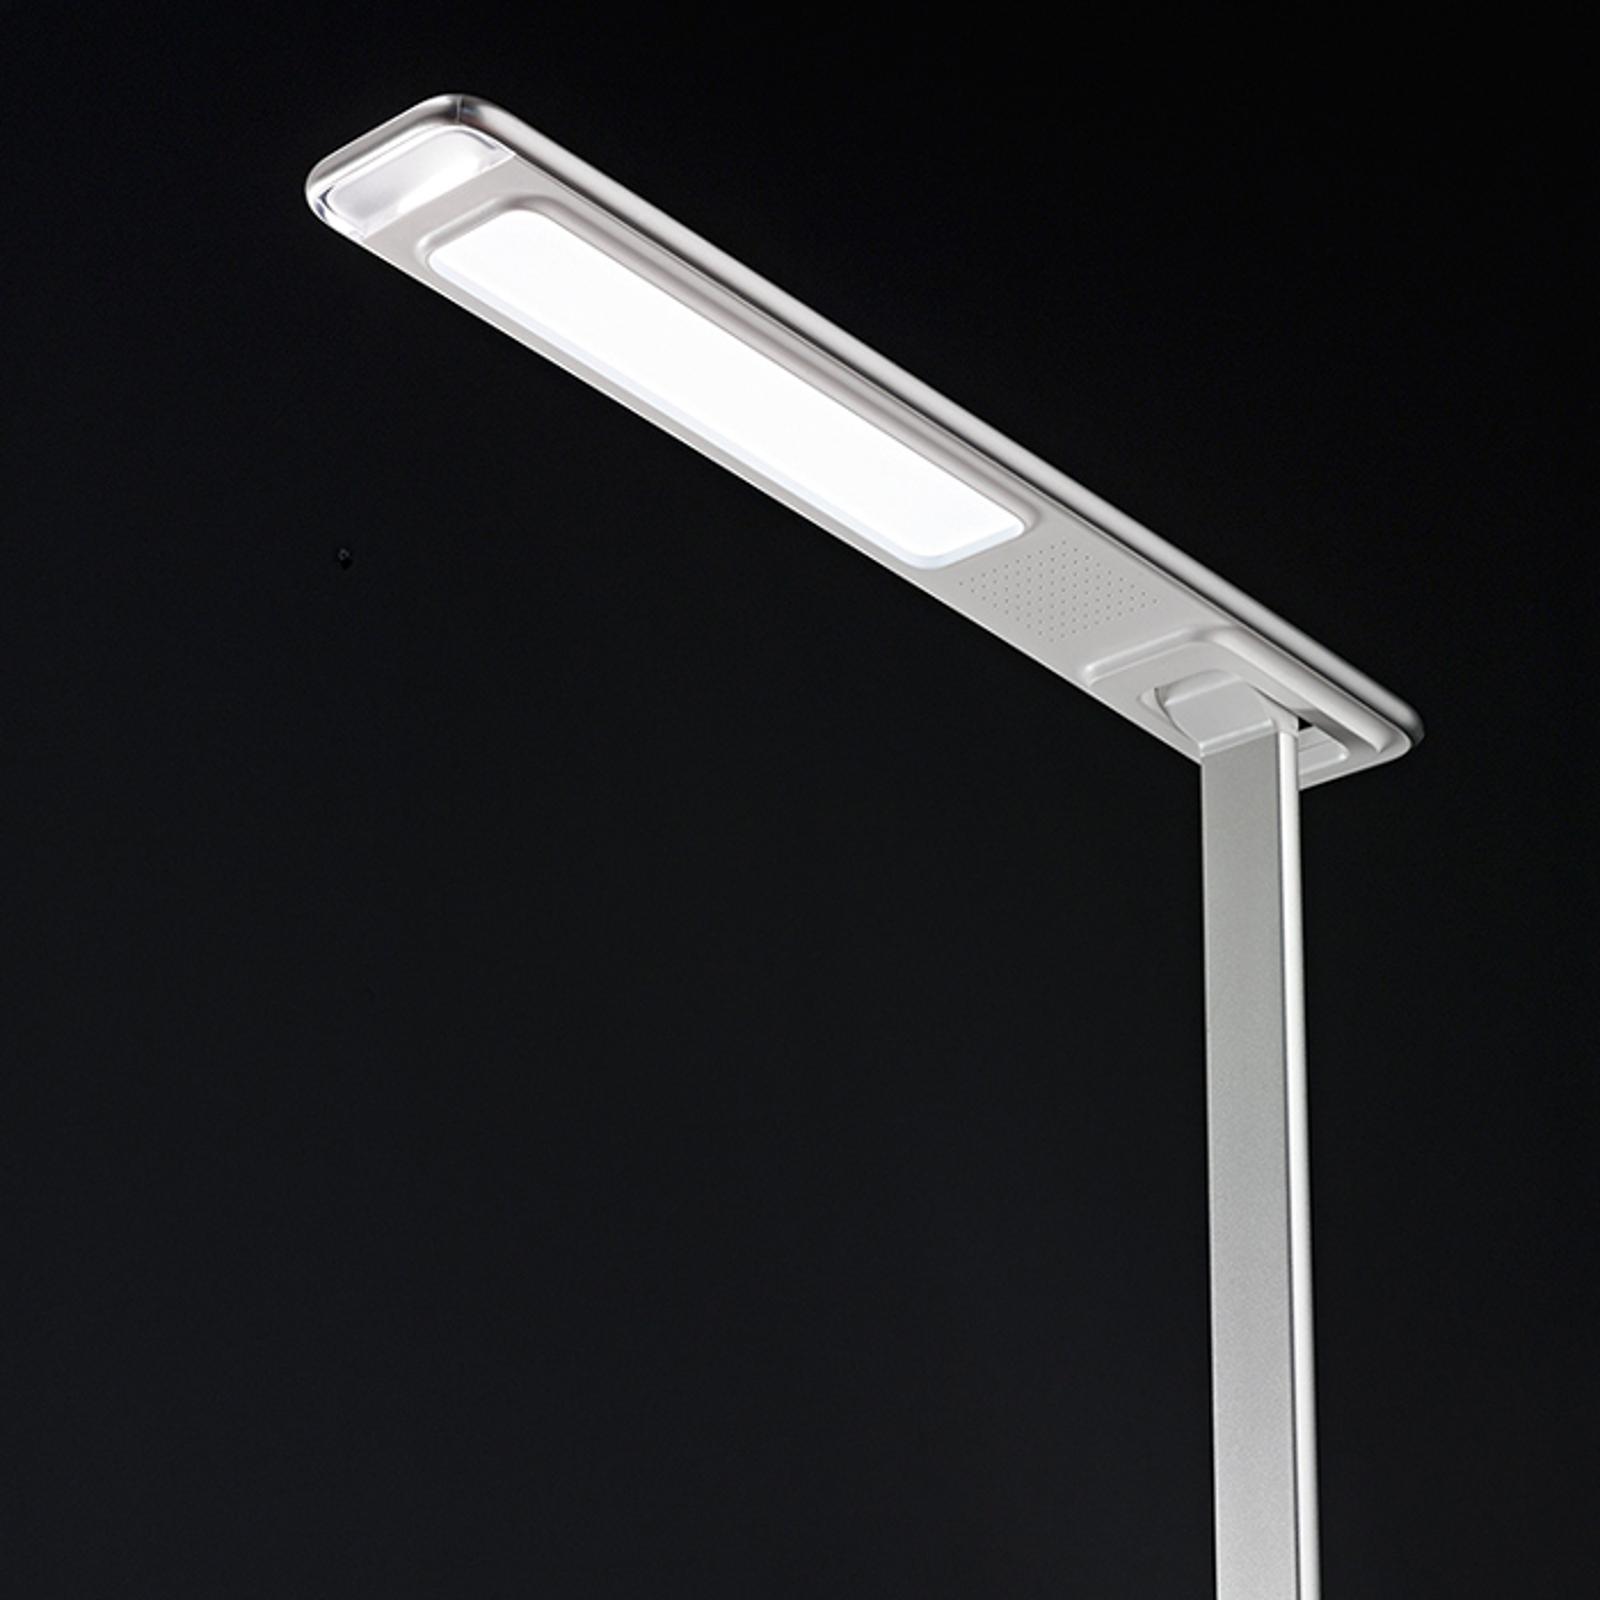 LED bureaulamp Ivo m. inductieve laadoppervlak